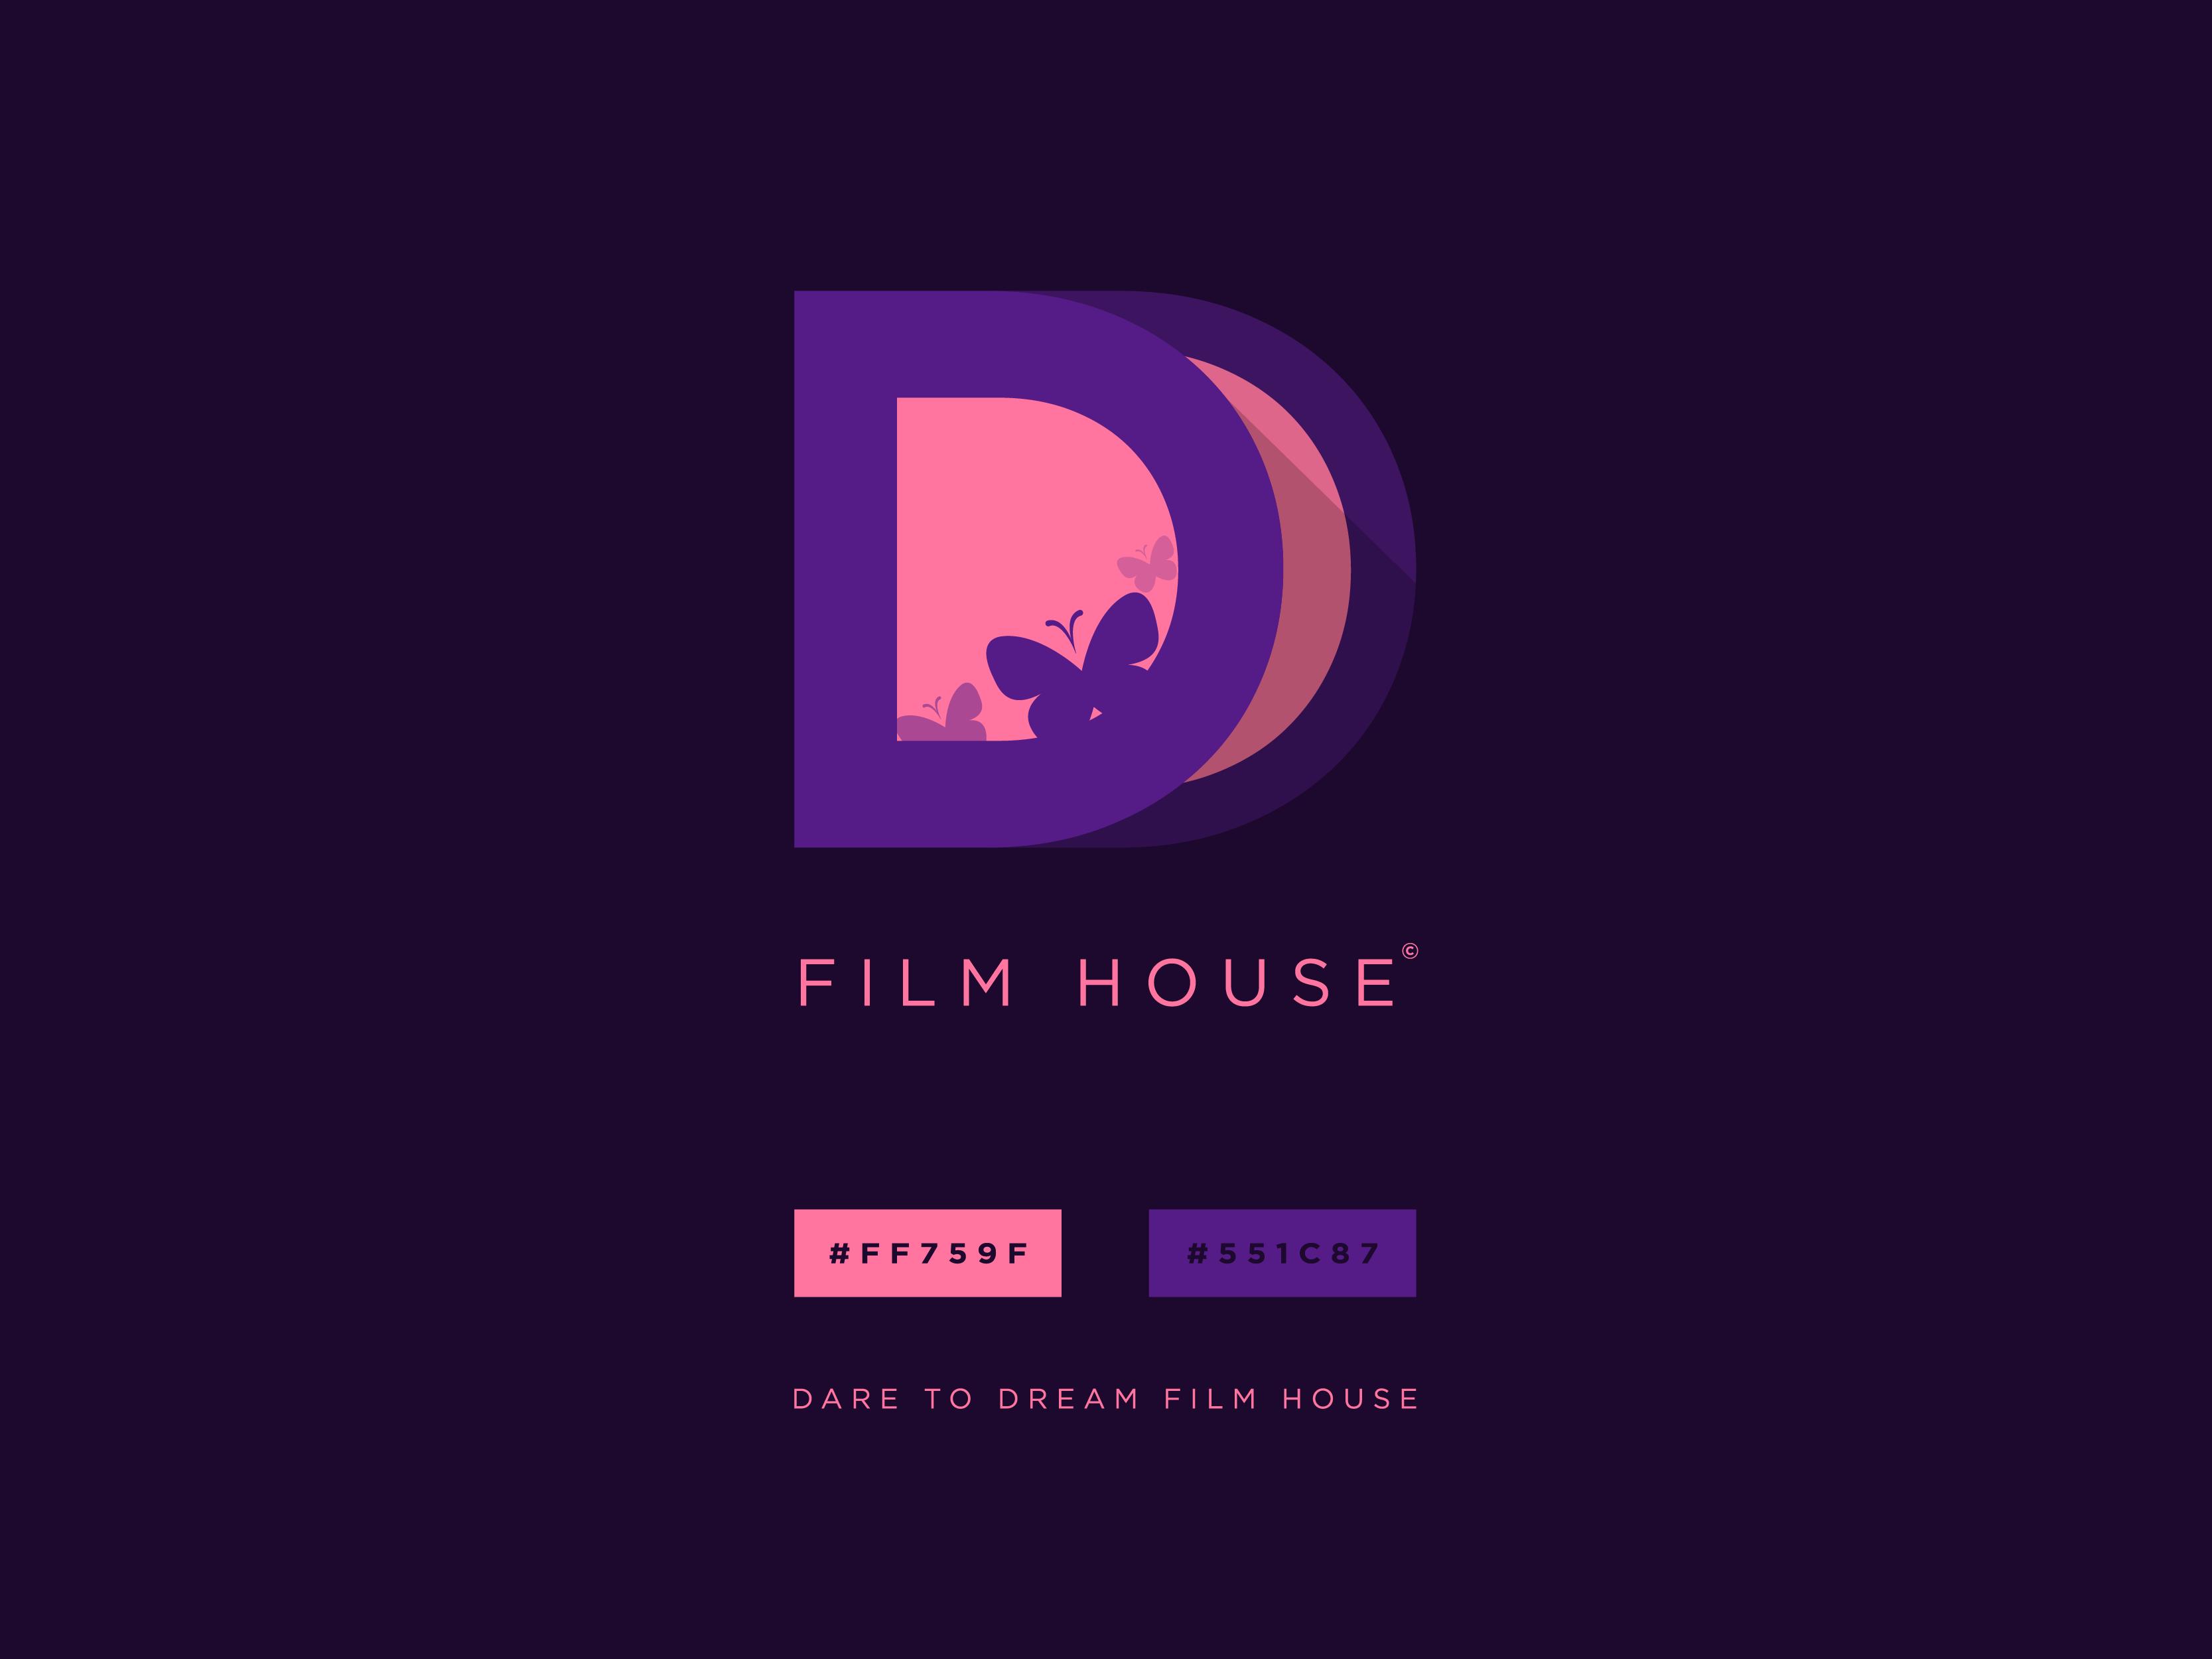 Dare To Dream Film House Film Dares Dream